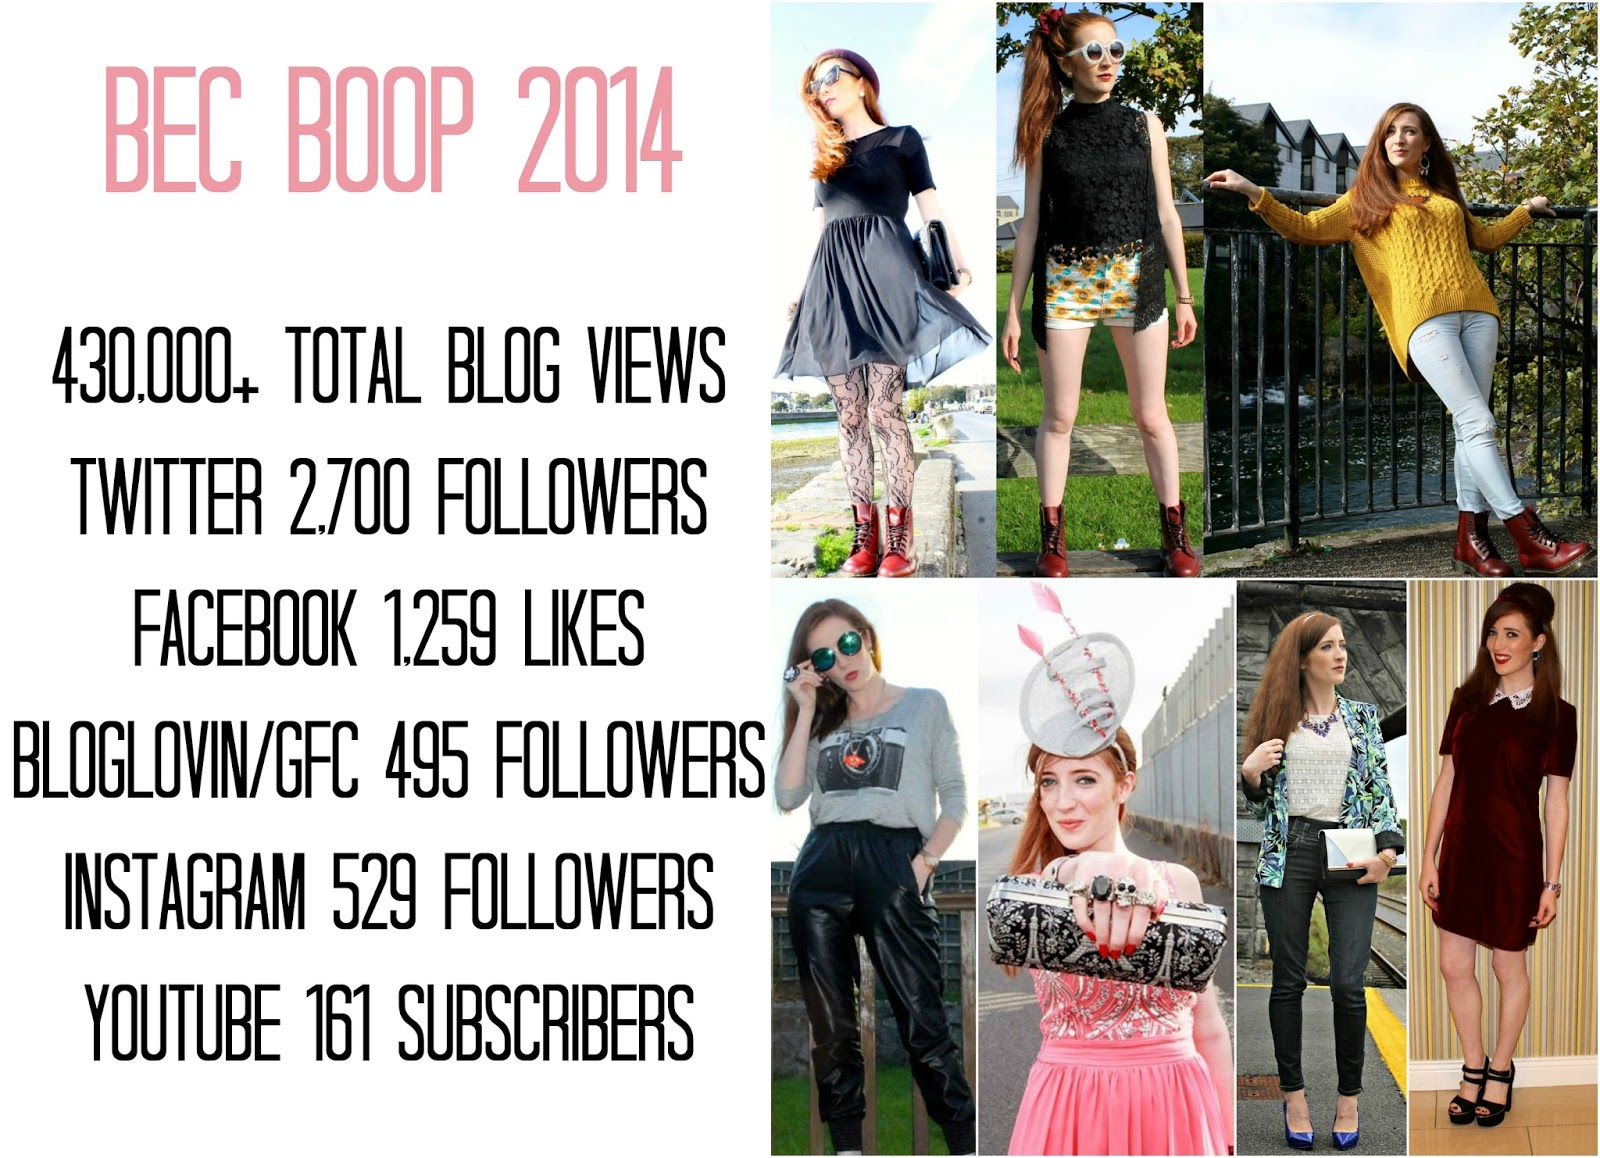 bec boop blog 2014 year